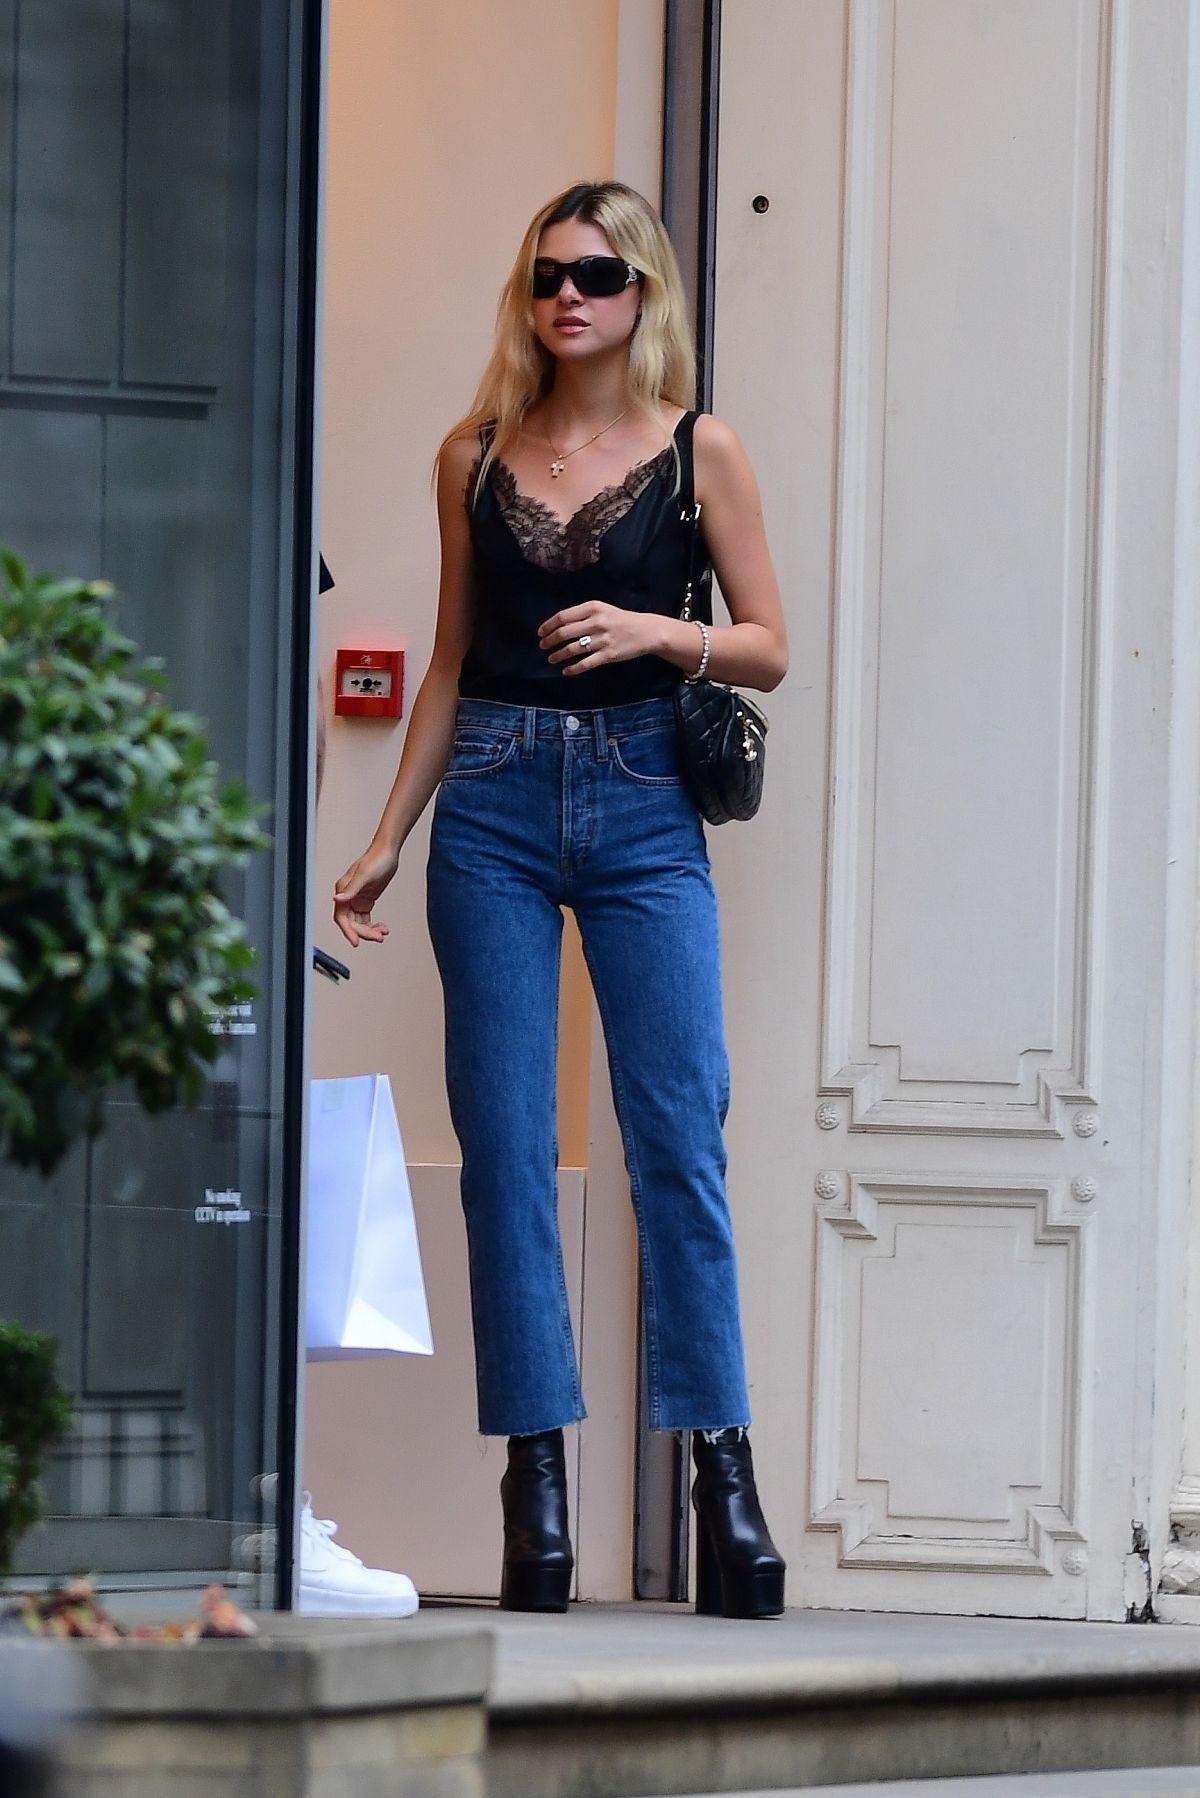 Nicola Peltz Brooklyn Beckham Leaves Victoria Beckhams Store London